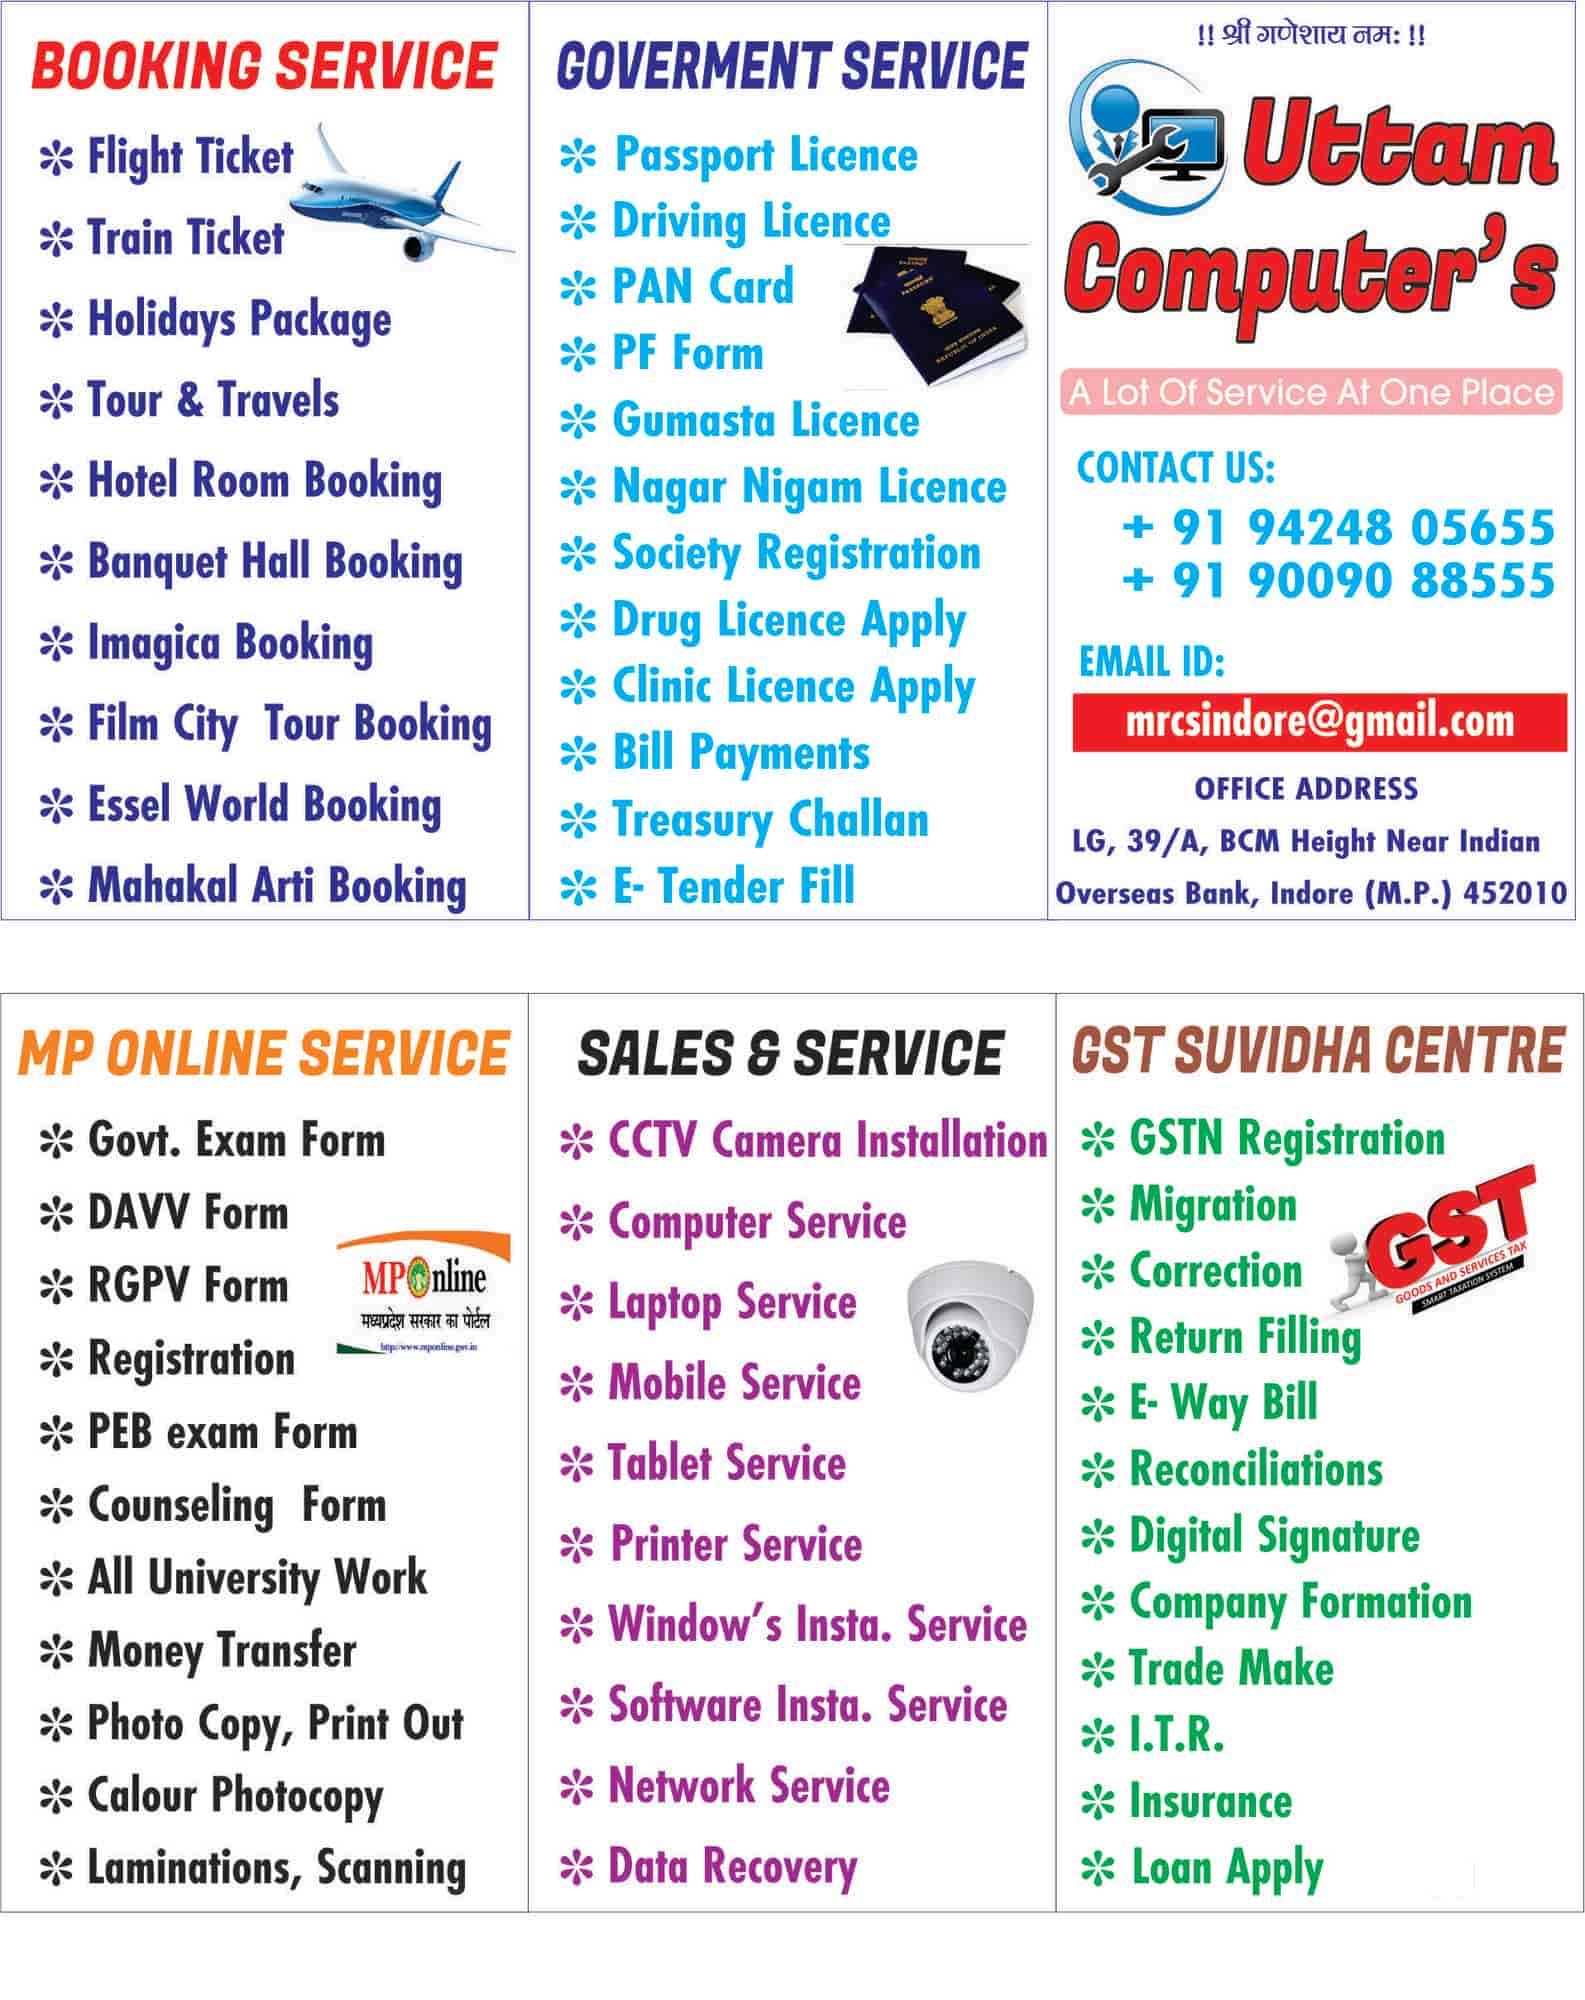 Uttam Computers, Satya Sai - Internet Service Providers in Indore